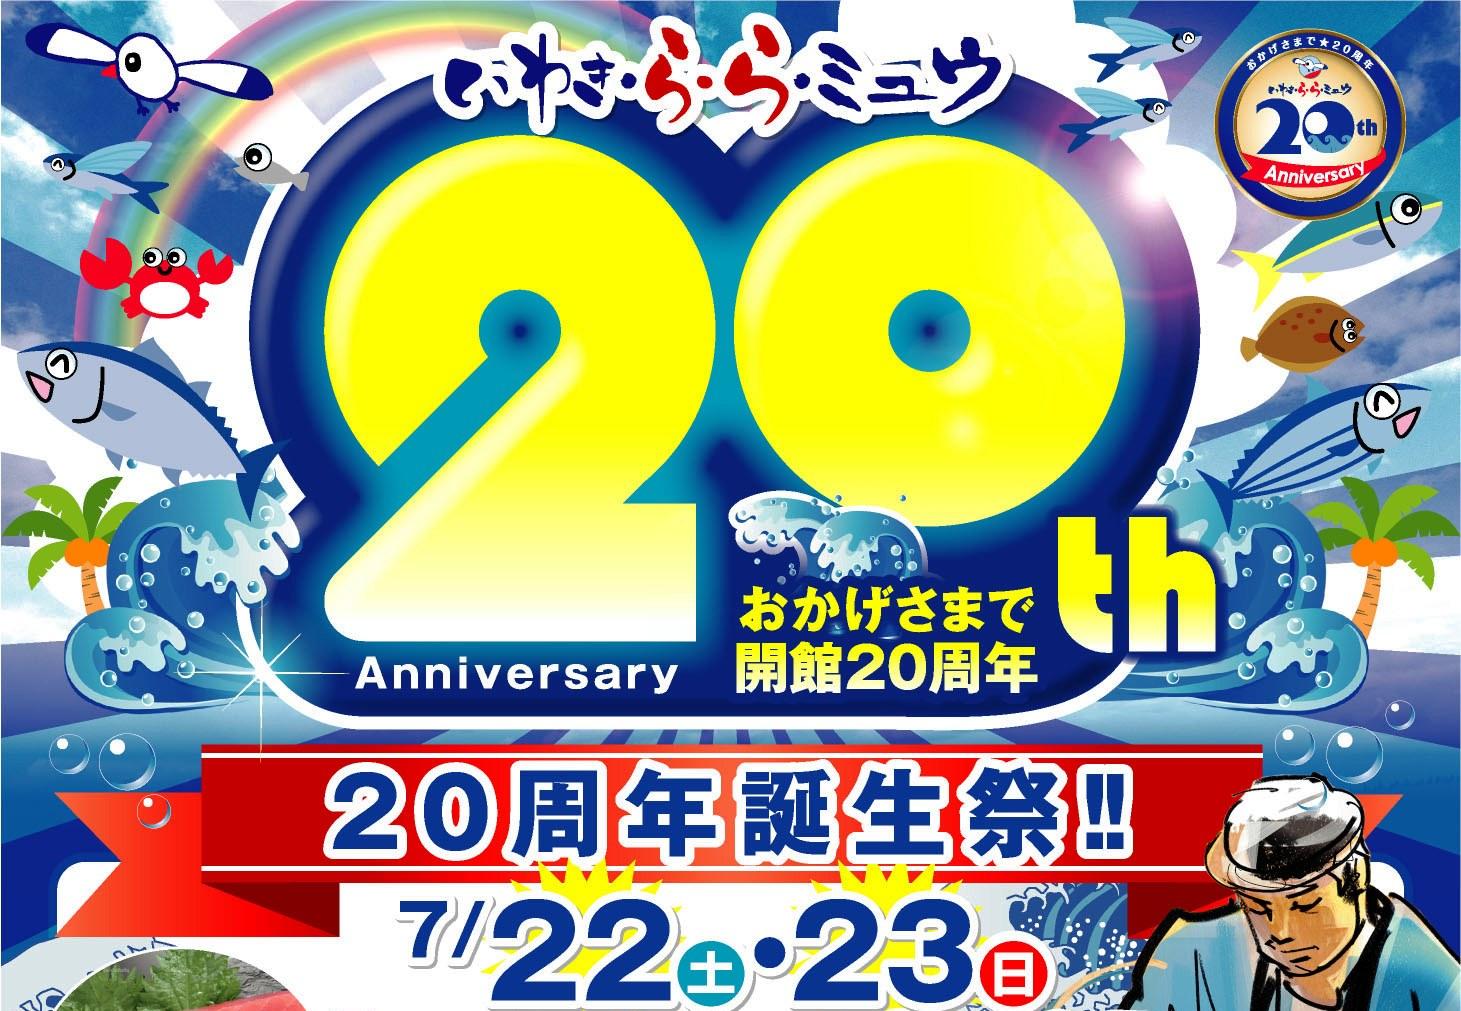 20周年誕生祭!! ヒーロー撮影会&握手会!!